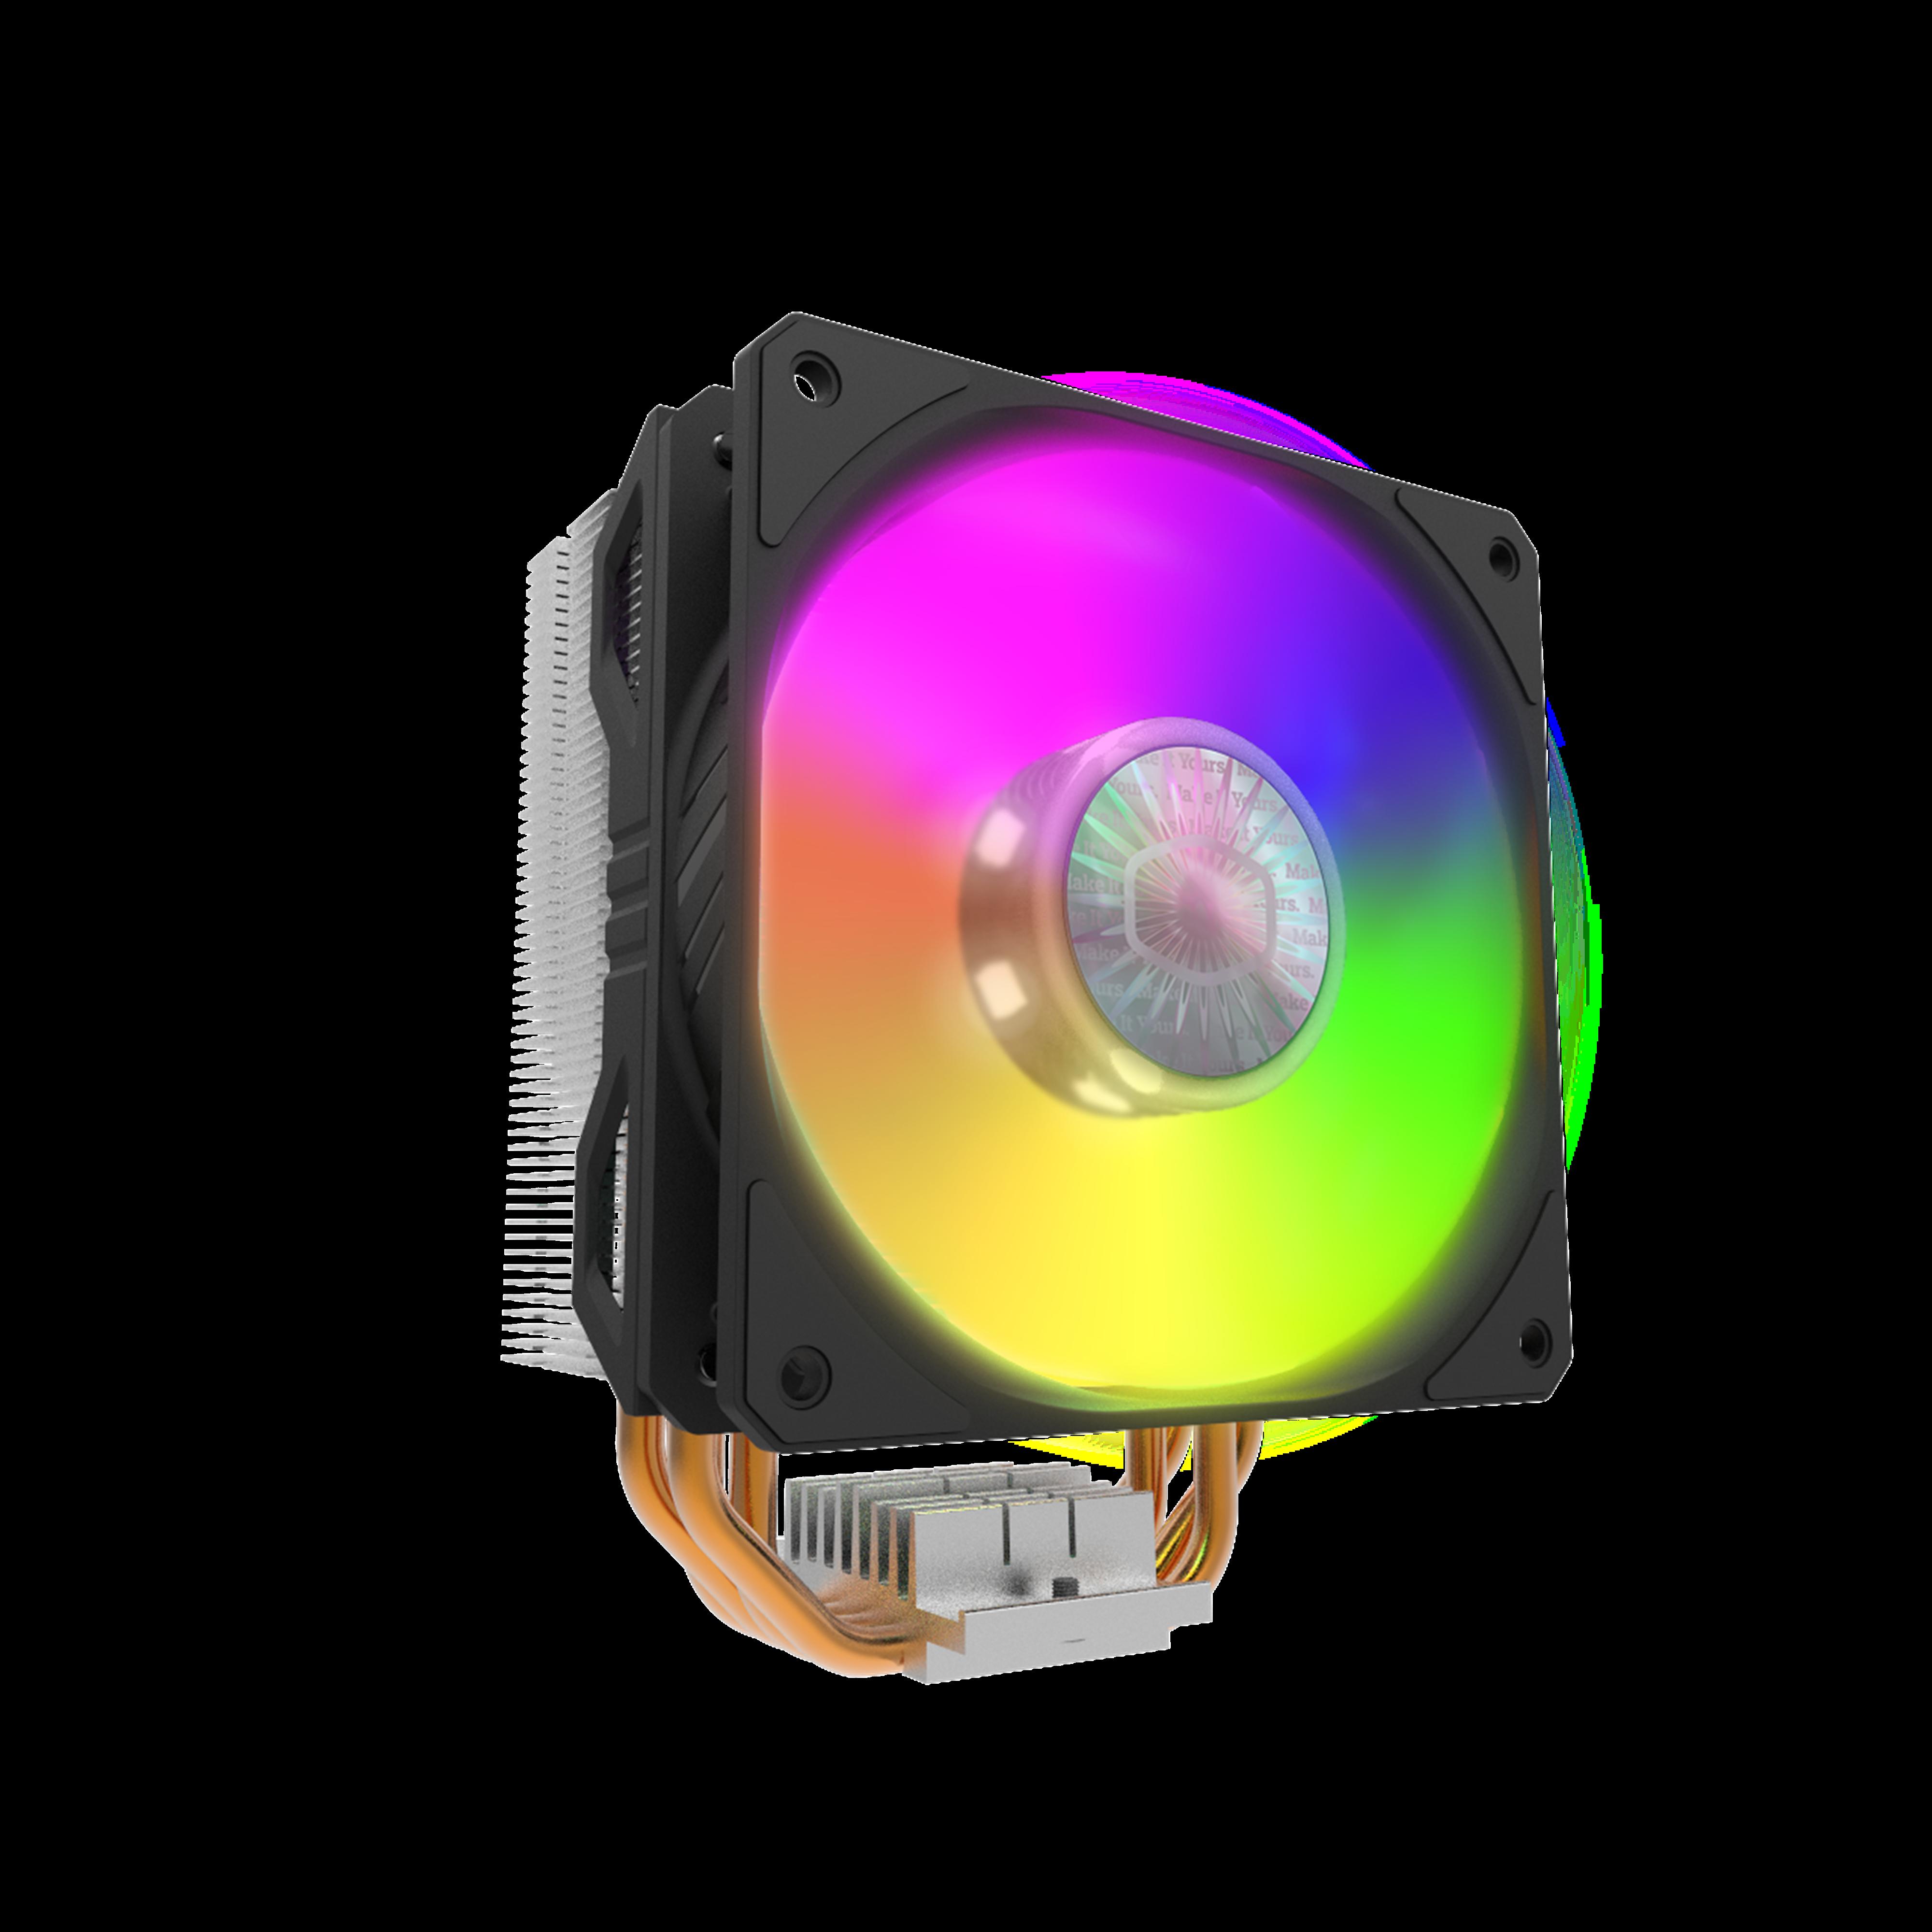 Tản nhiệt khí Cooler Master Hyper 212 ARGB V2 Spectrum